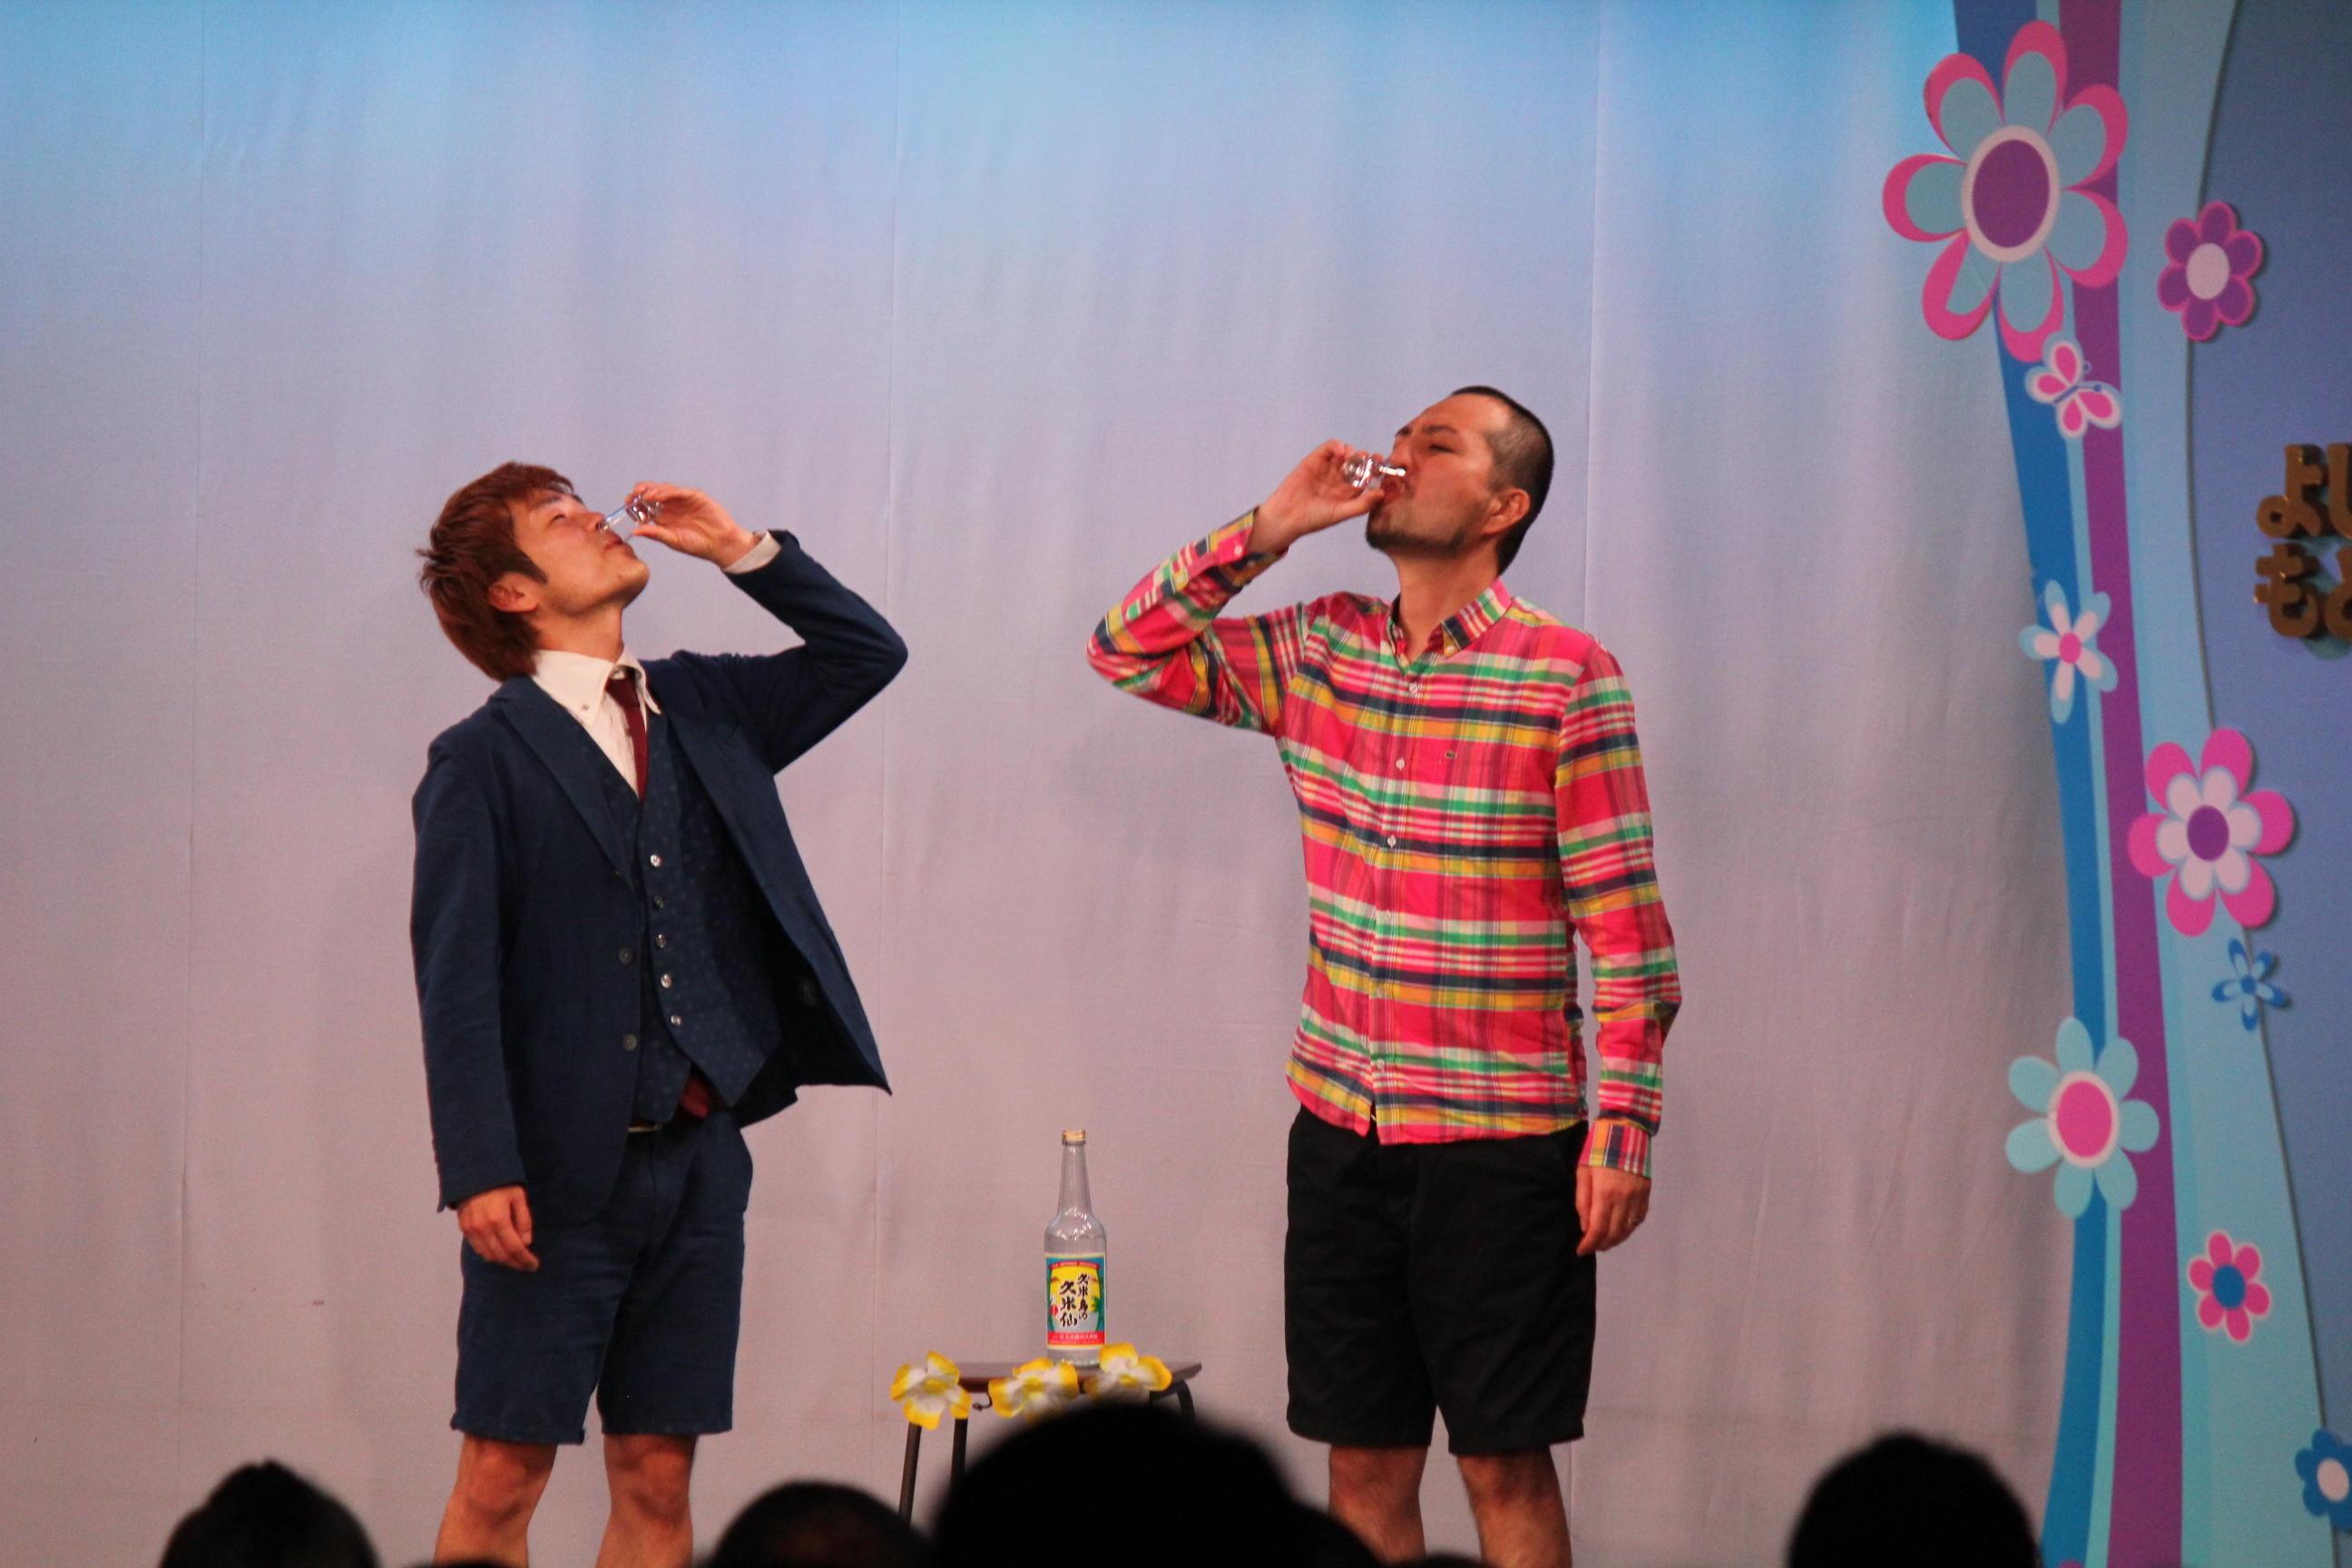 http://news.yoshimoto.co.jp/20161018173426-61425760902fd3fbba56b34c1ea7ec6ffbb7fc0a.jpg